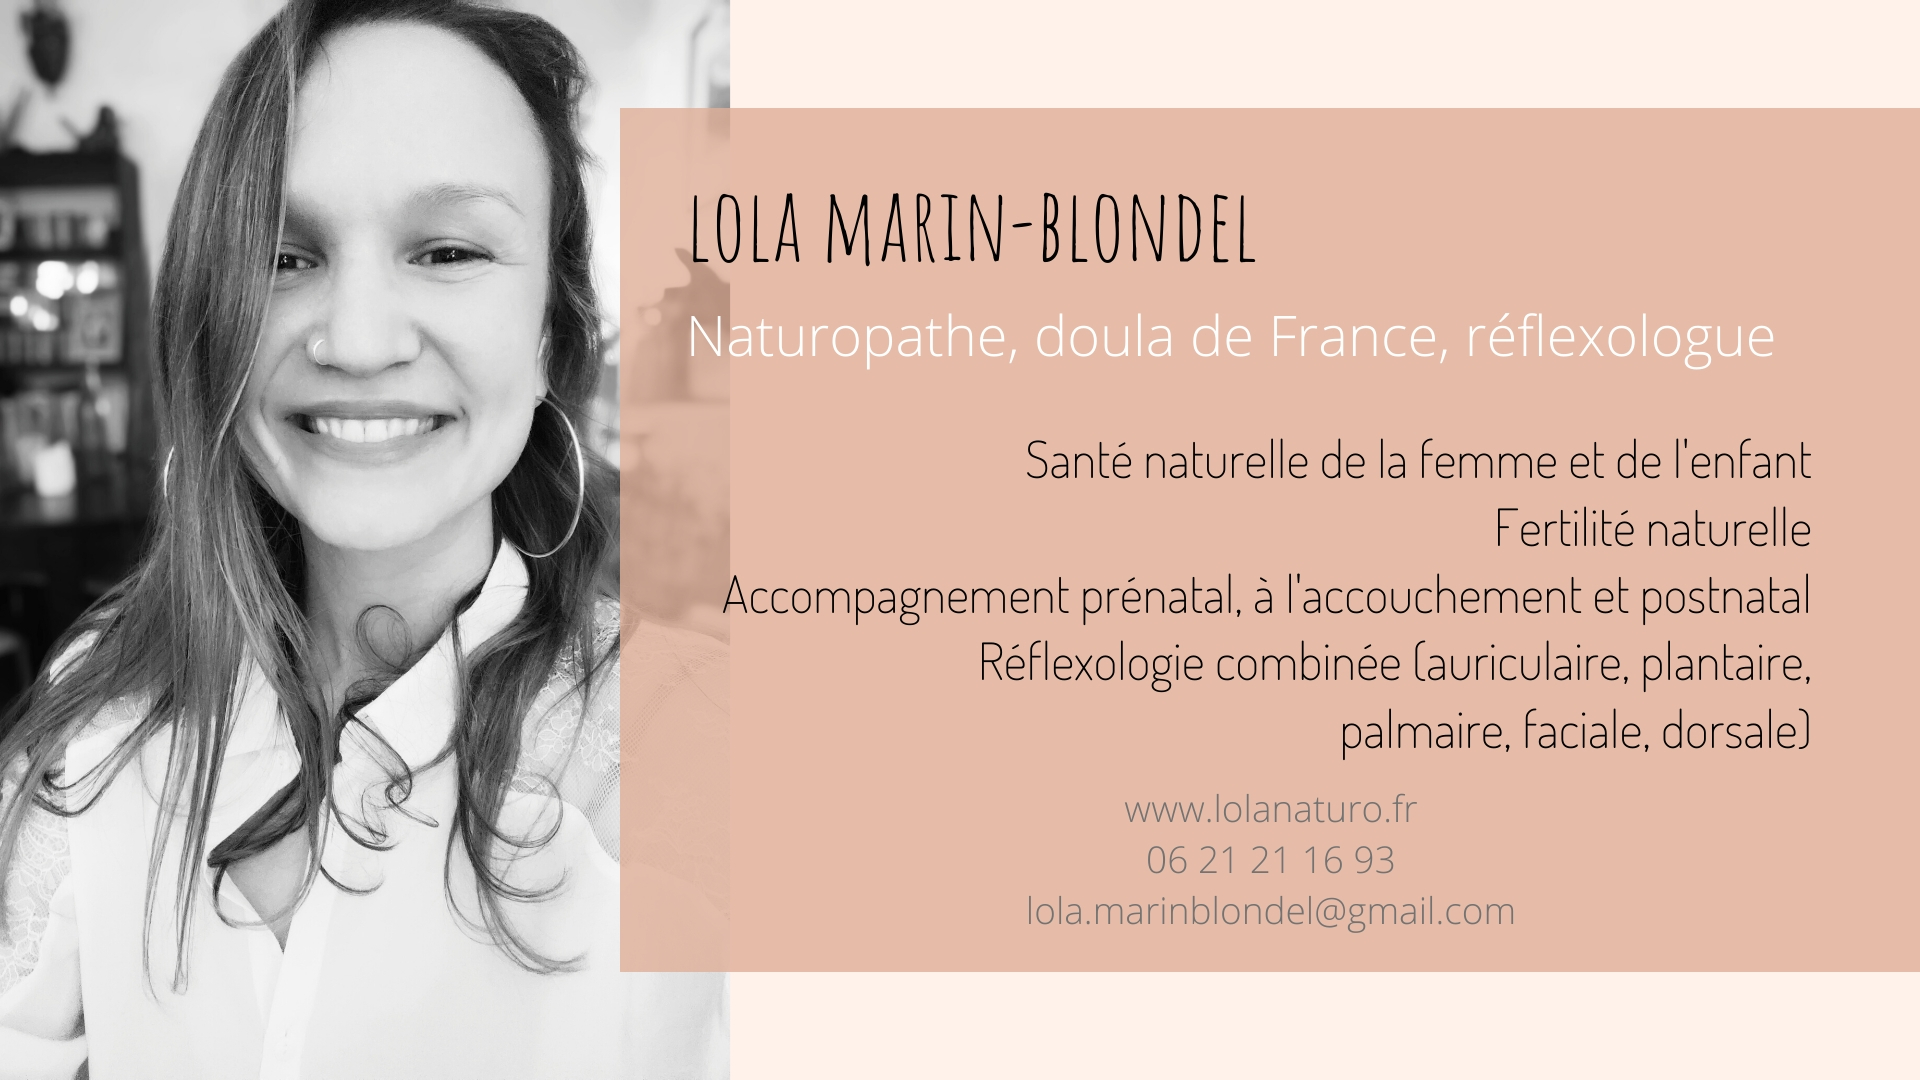 Lola Marin-Blondel